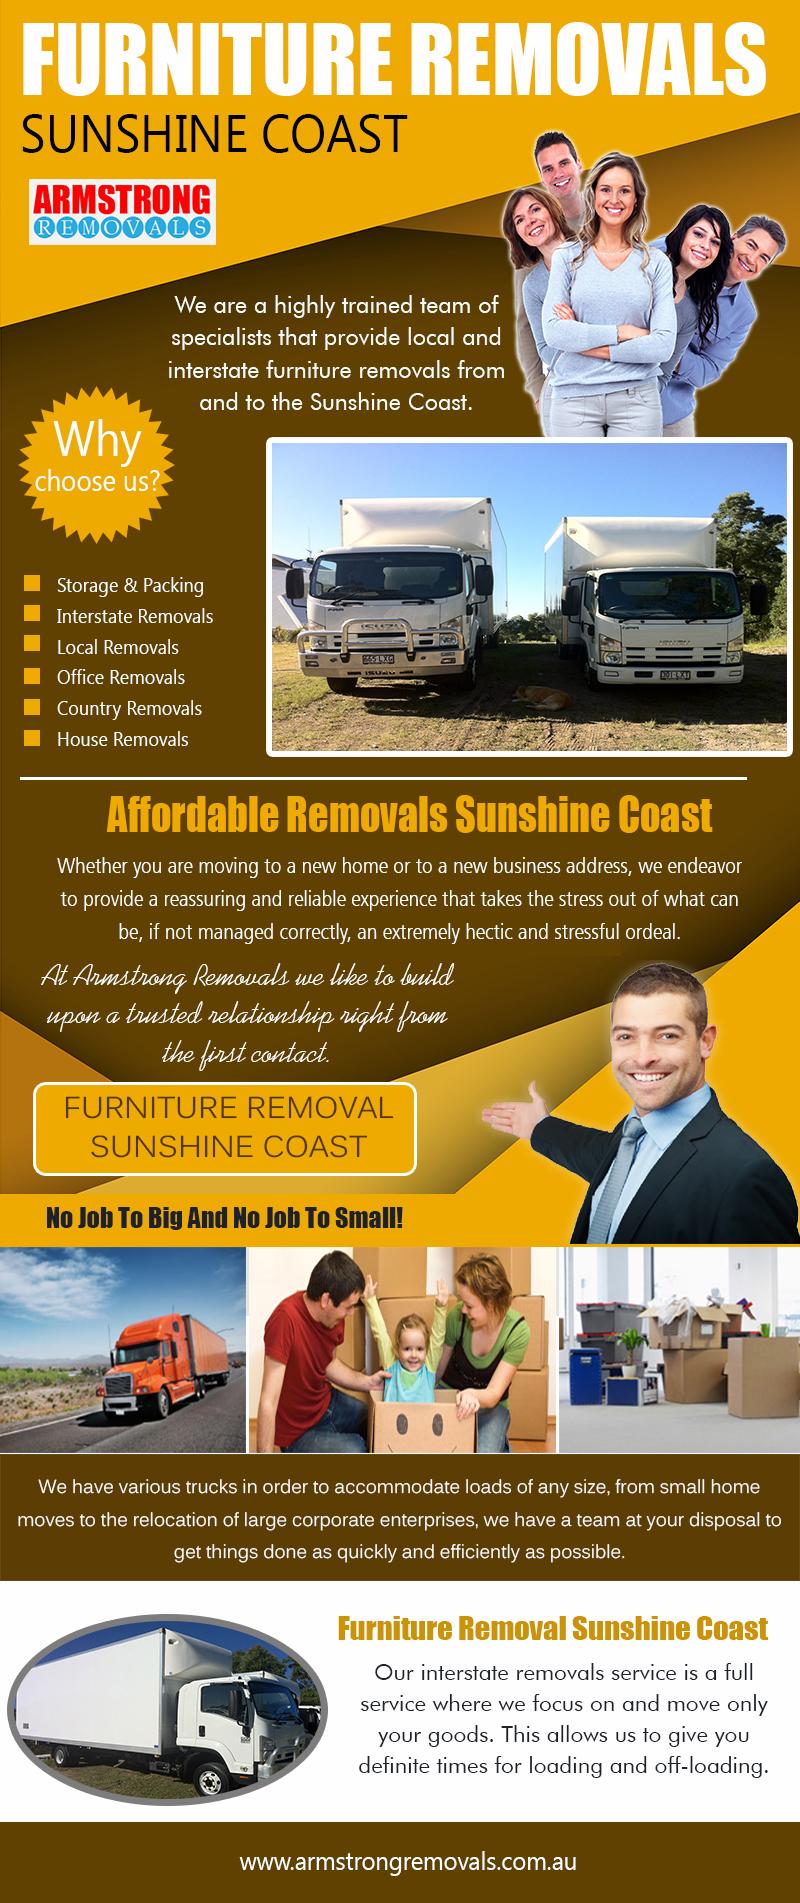 Furniture Removals Sunshine Coast https://armstrongremovals.com.au/